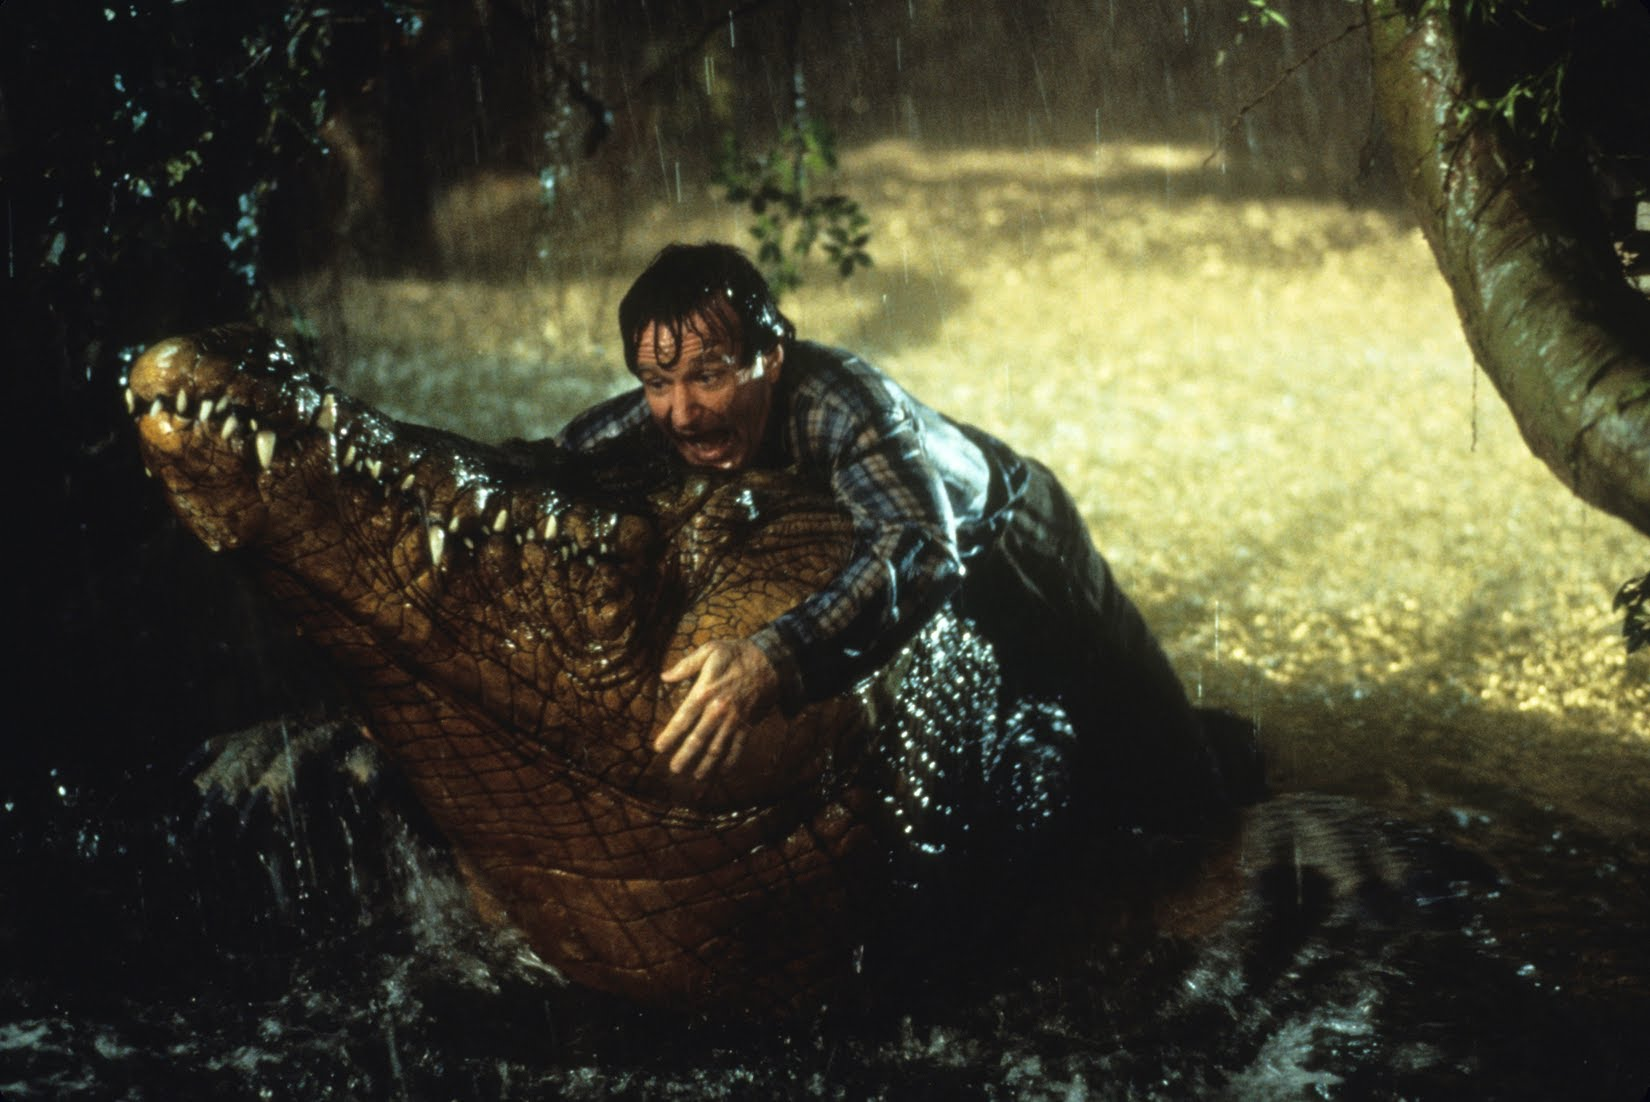 Jumanji Crocodile Alan 20 Facts You Probably Didn't Know About Jumanji